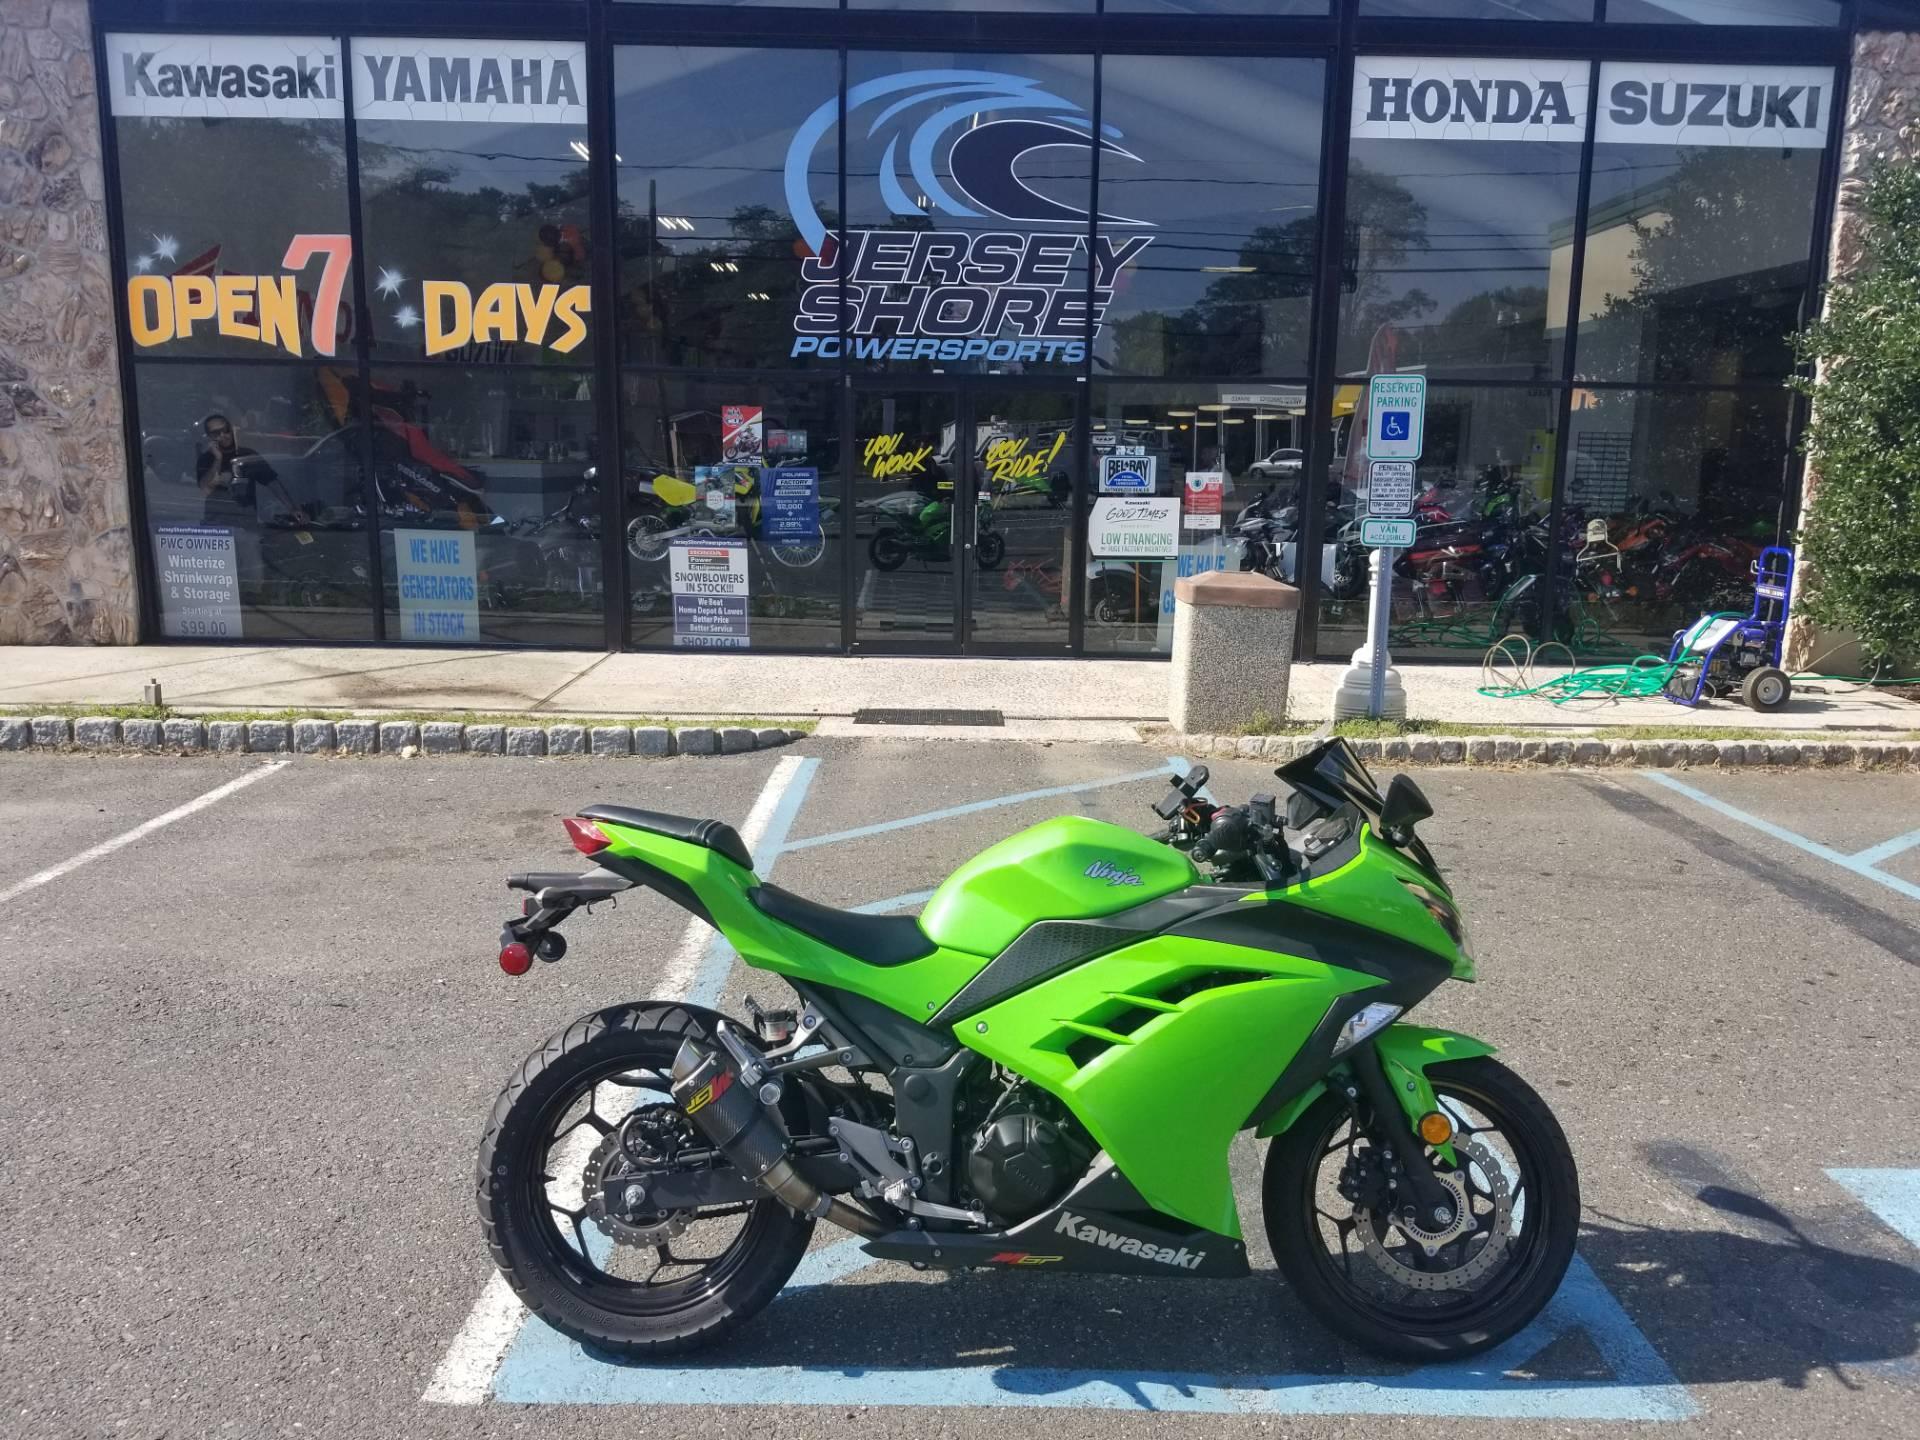 Used 2015 Kawasaki Ninja 300 Abs Lime Green Motorcycles In